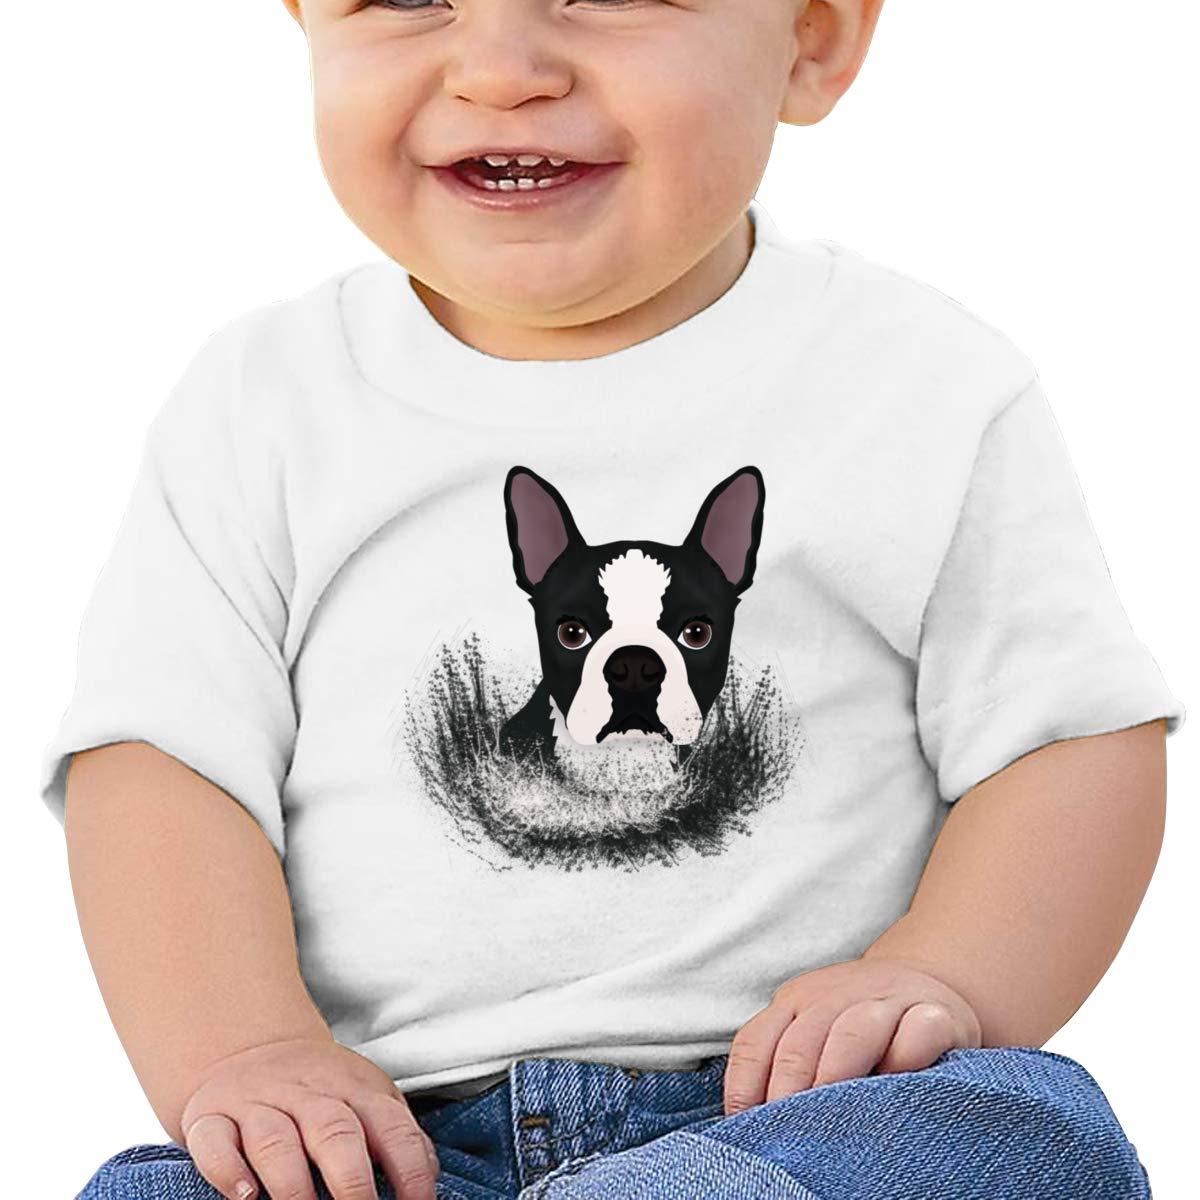 Qiop Nee Puppy Boston Terrier Dog Short Sleeve Tshirts Baby Boy